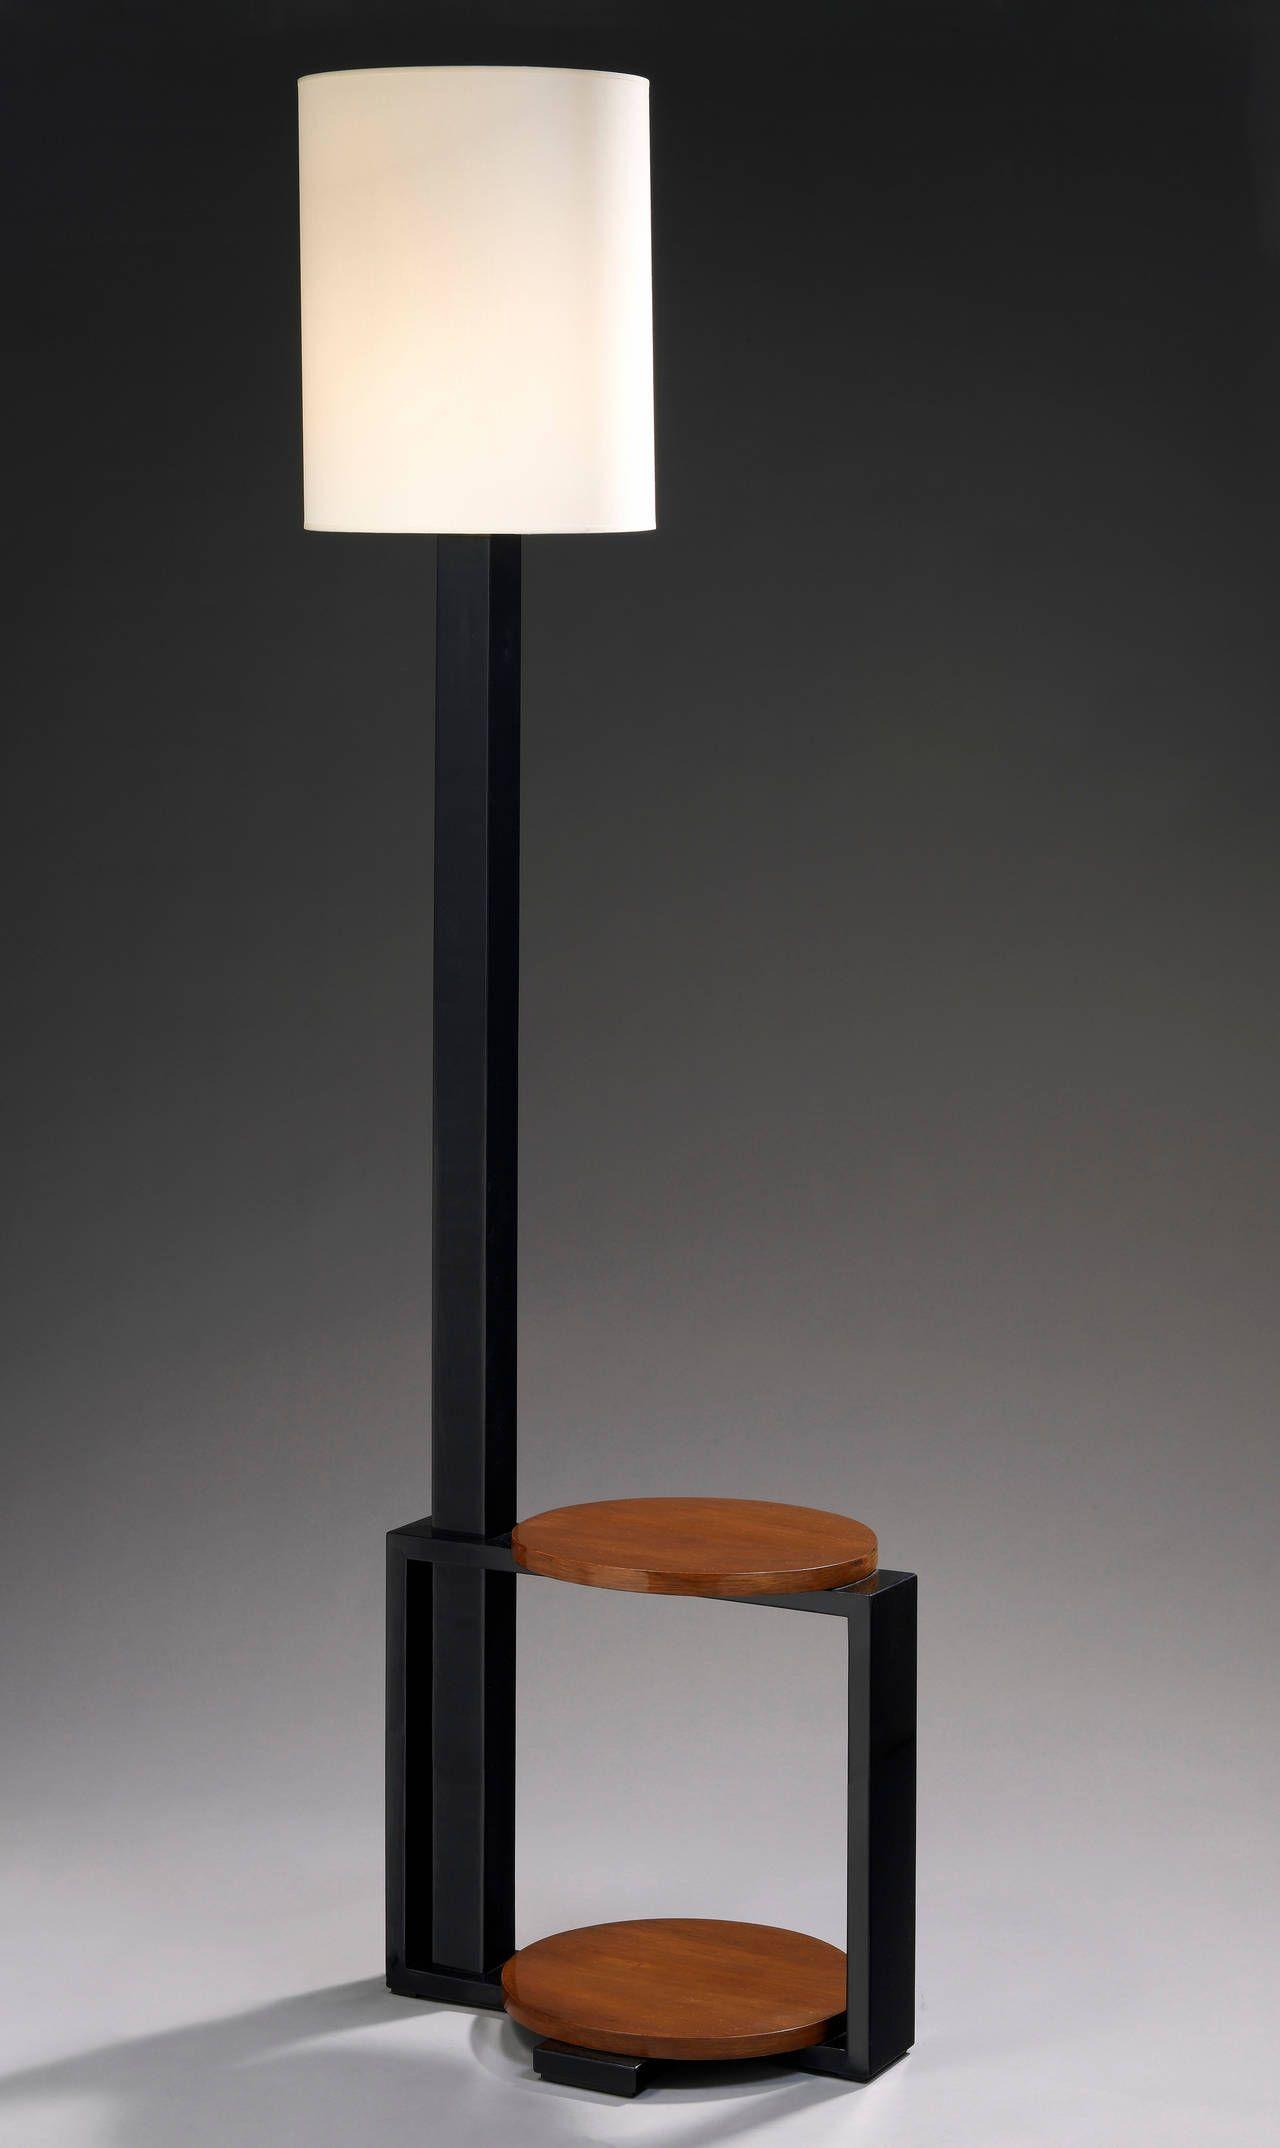 Andr Sornay, Mahogany Standard Lamp - 1Stdibscom